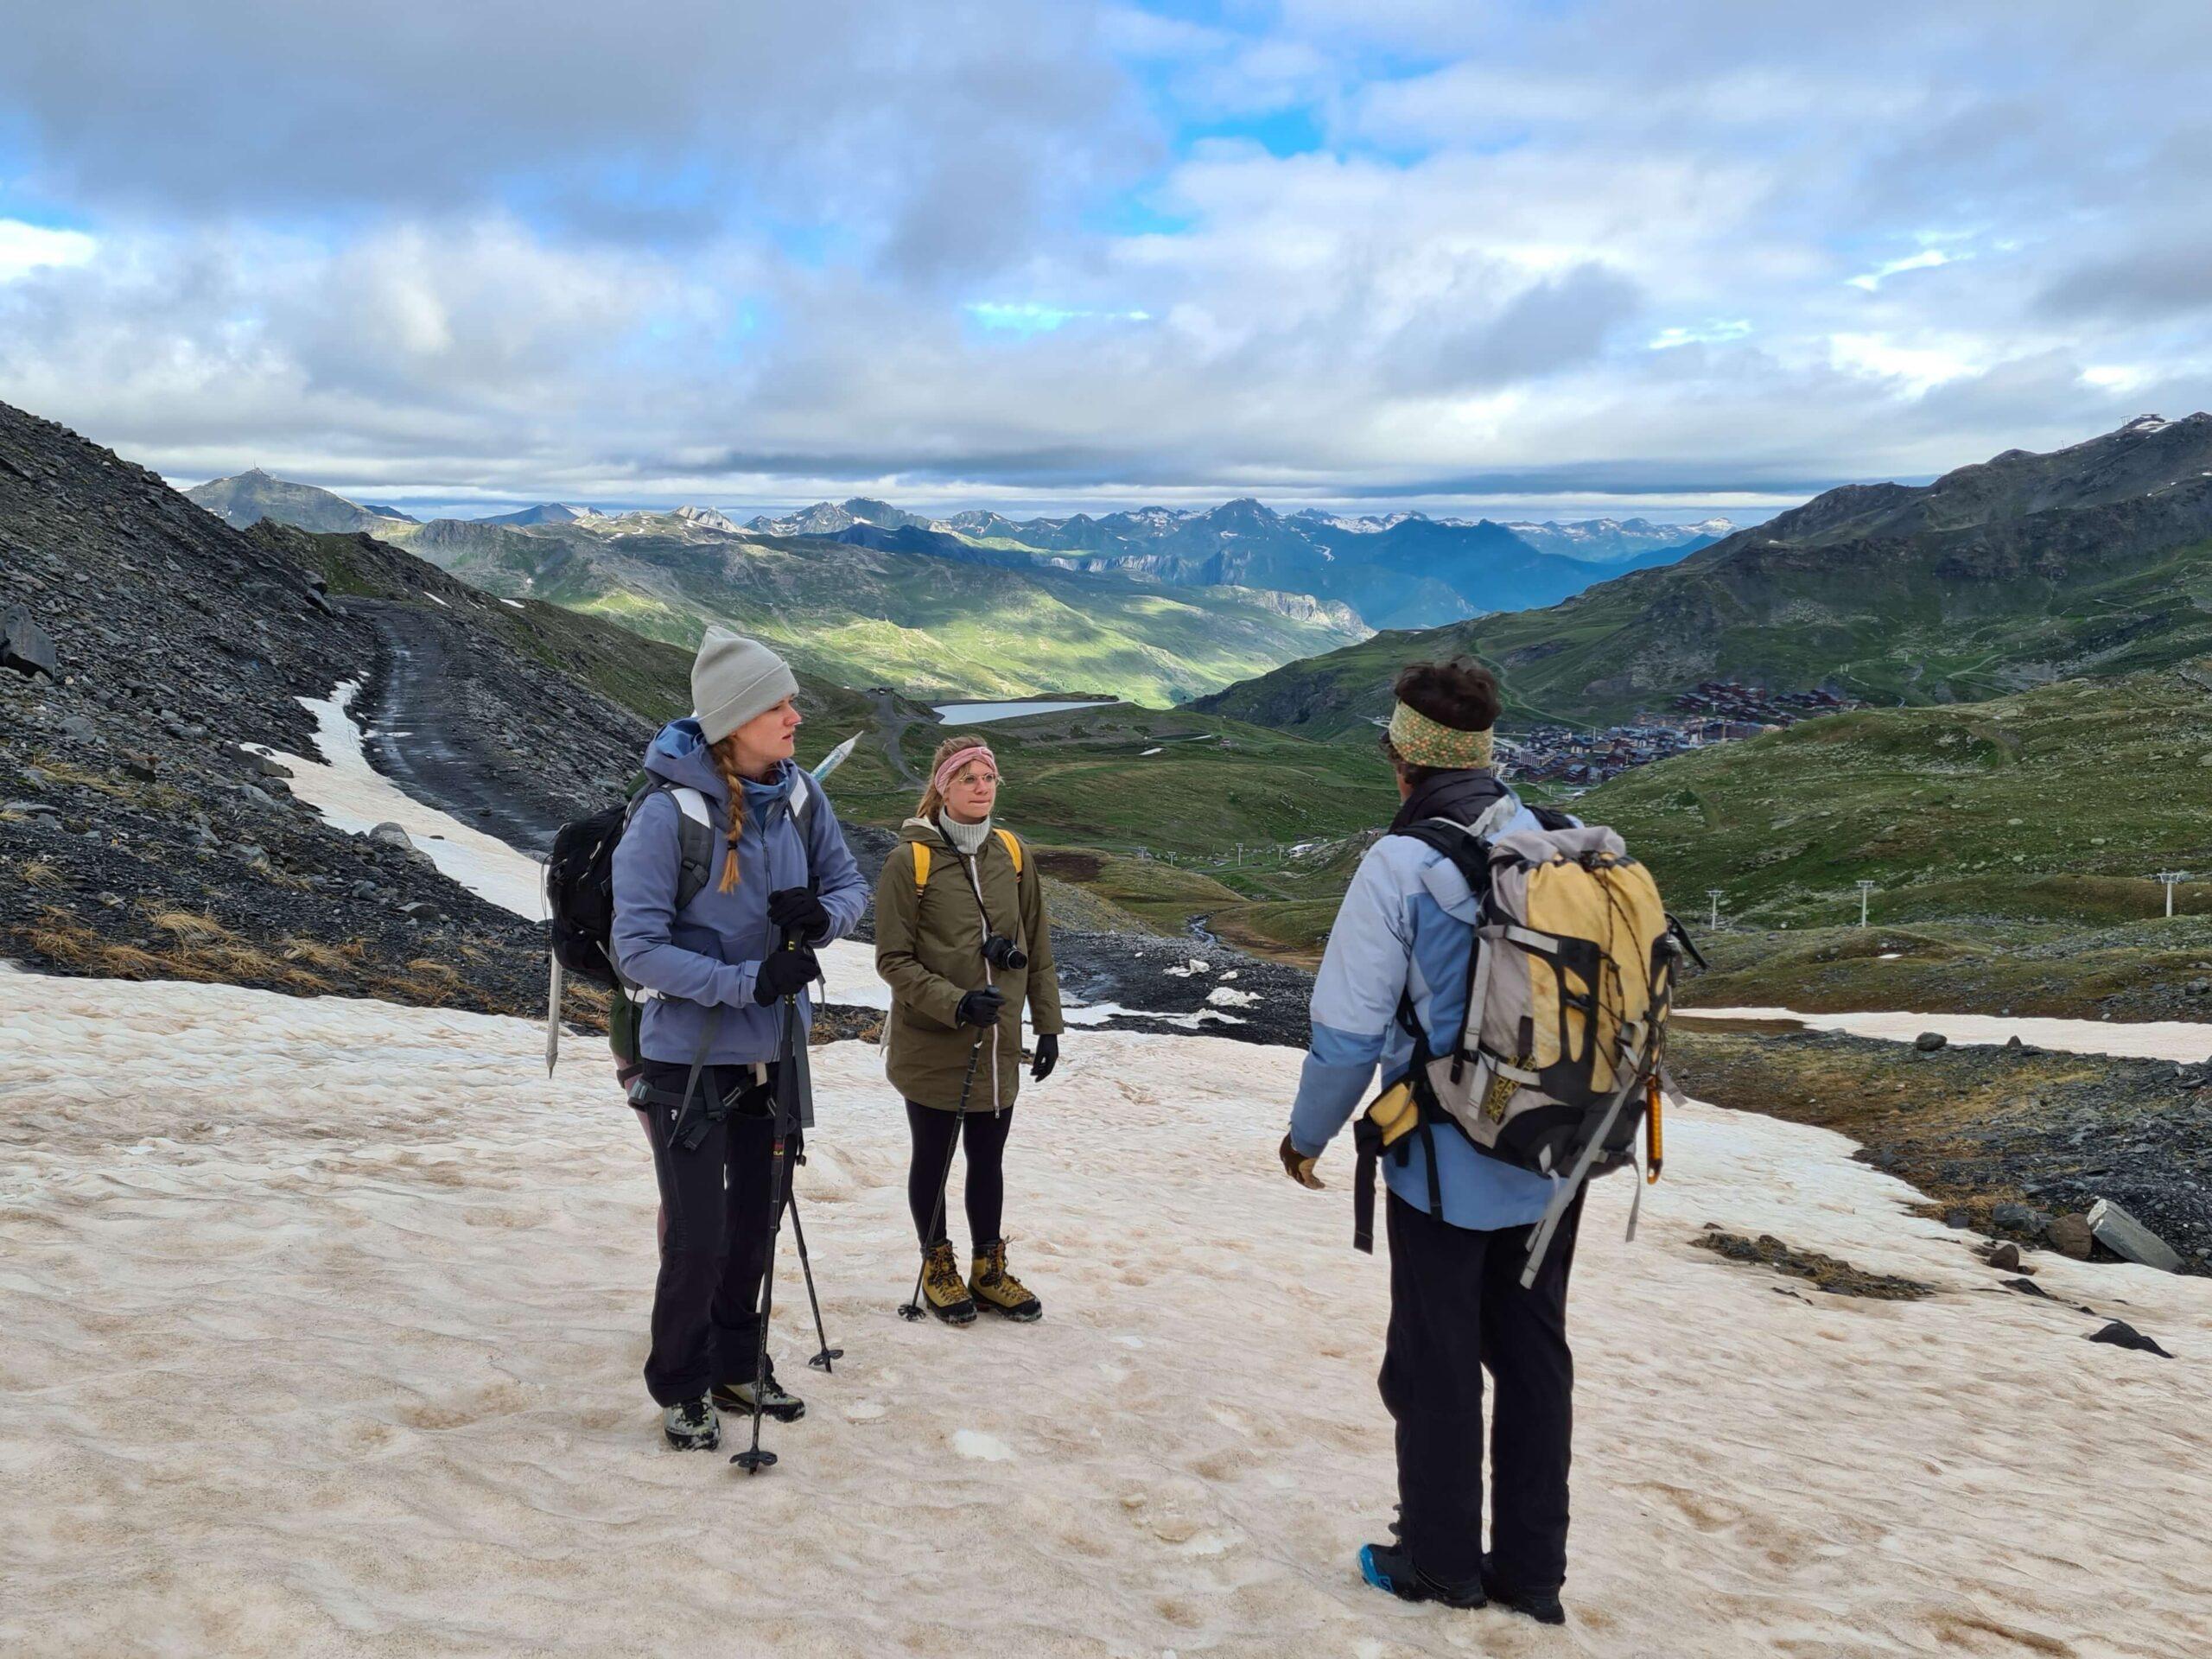 De gletjserwandeling vanuit Val Thorens is een ideale manier om kennis te maken met bergbeklimmen